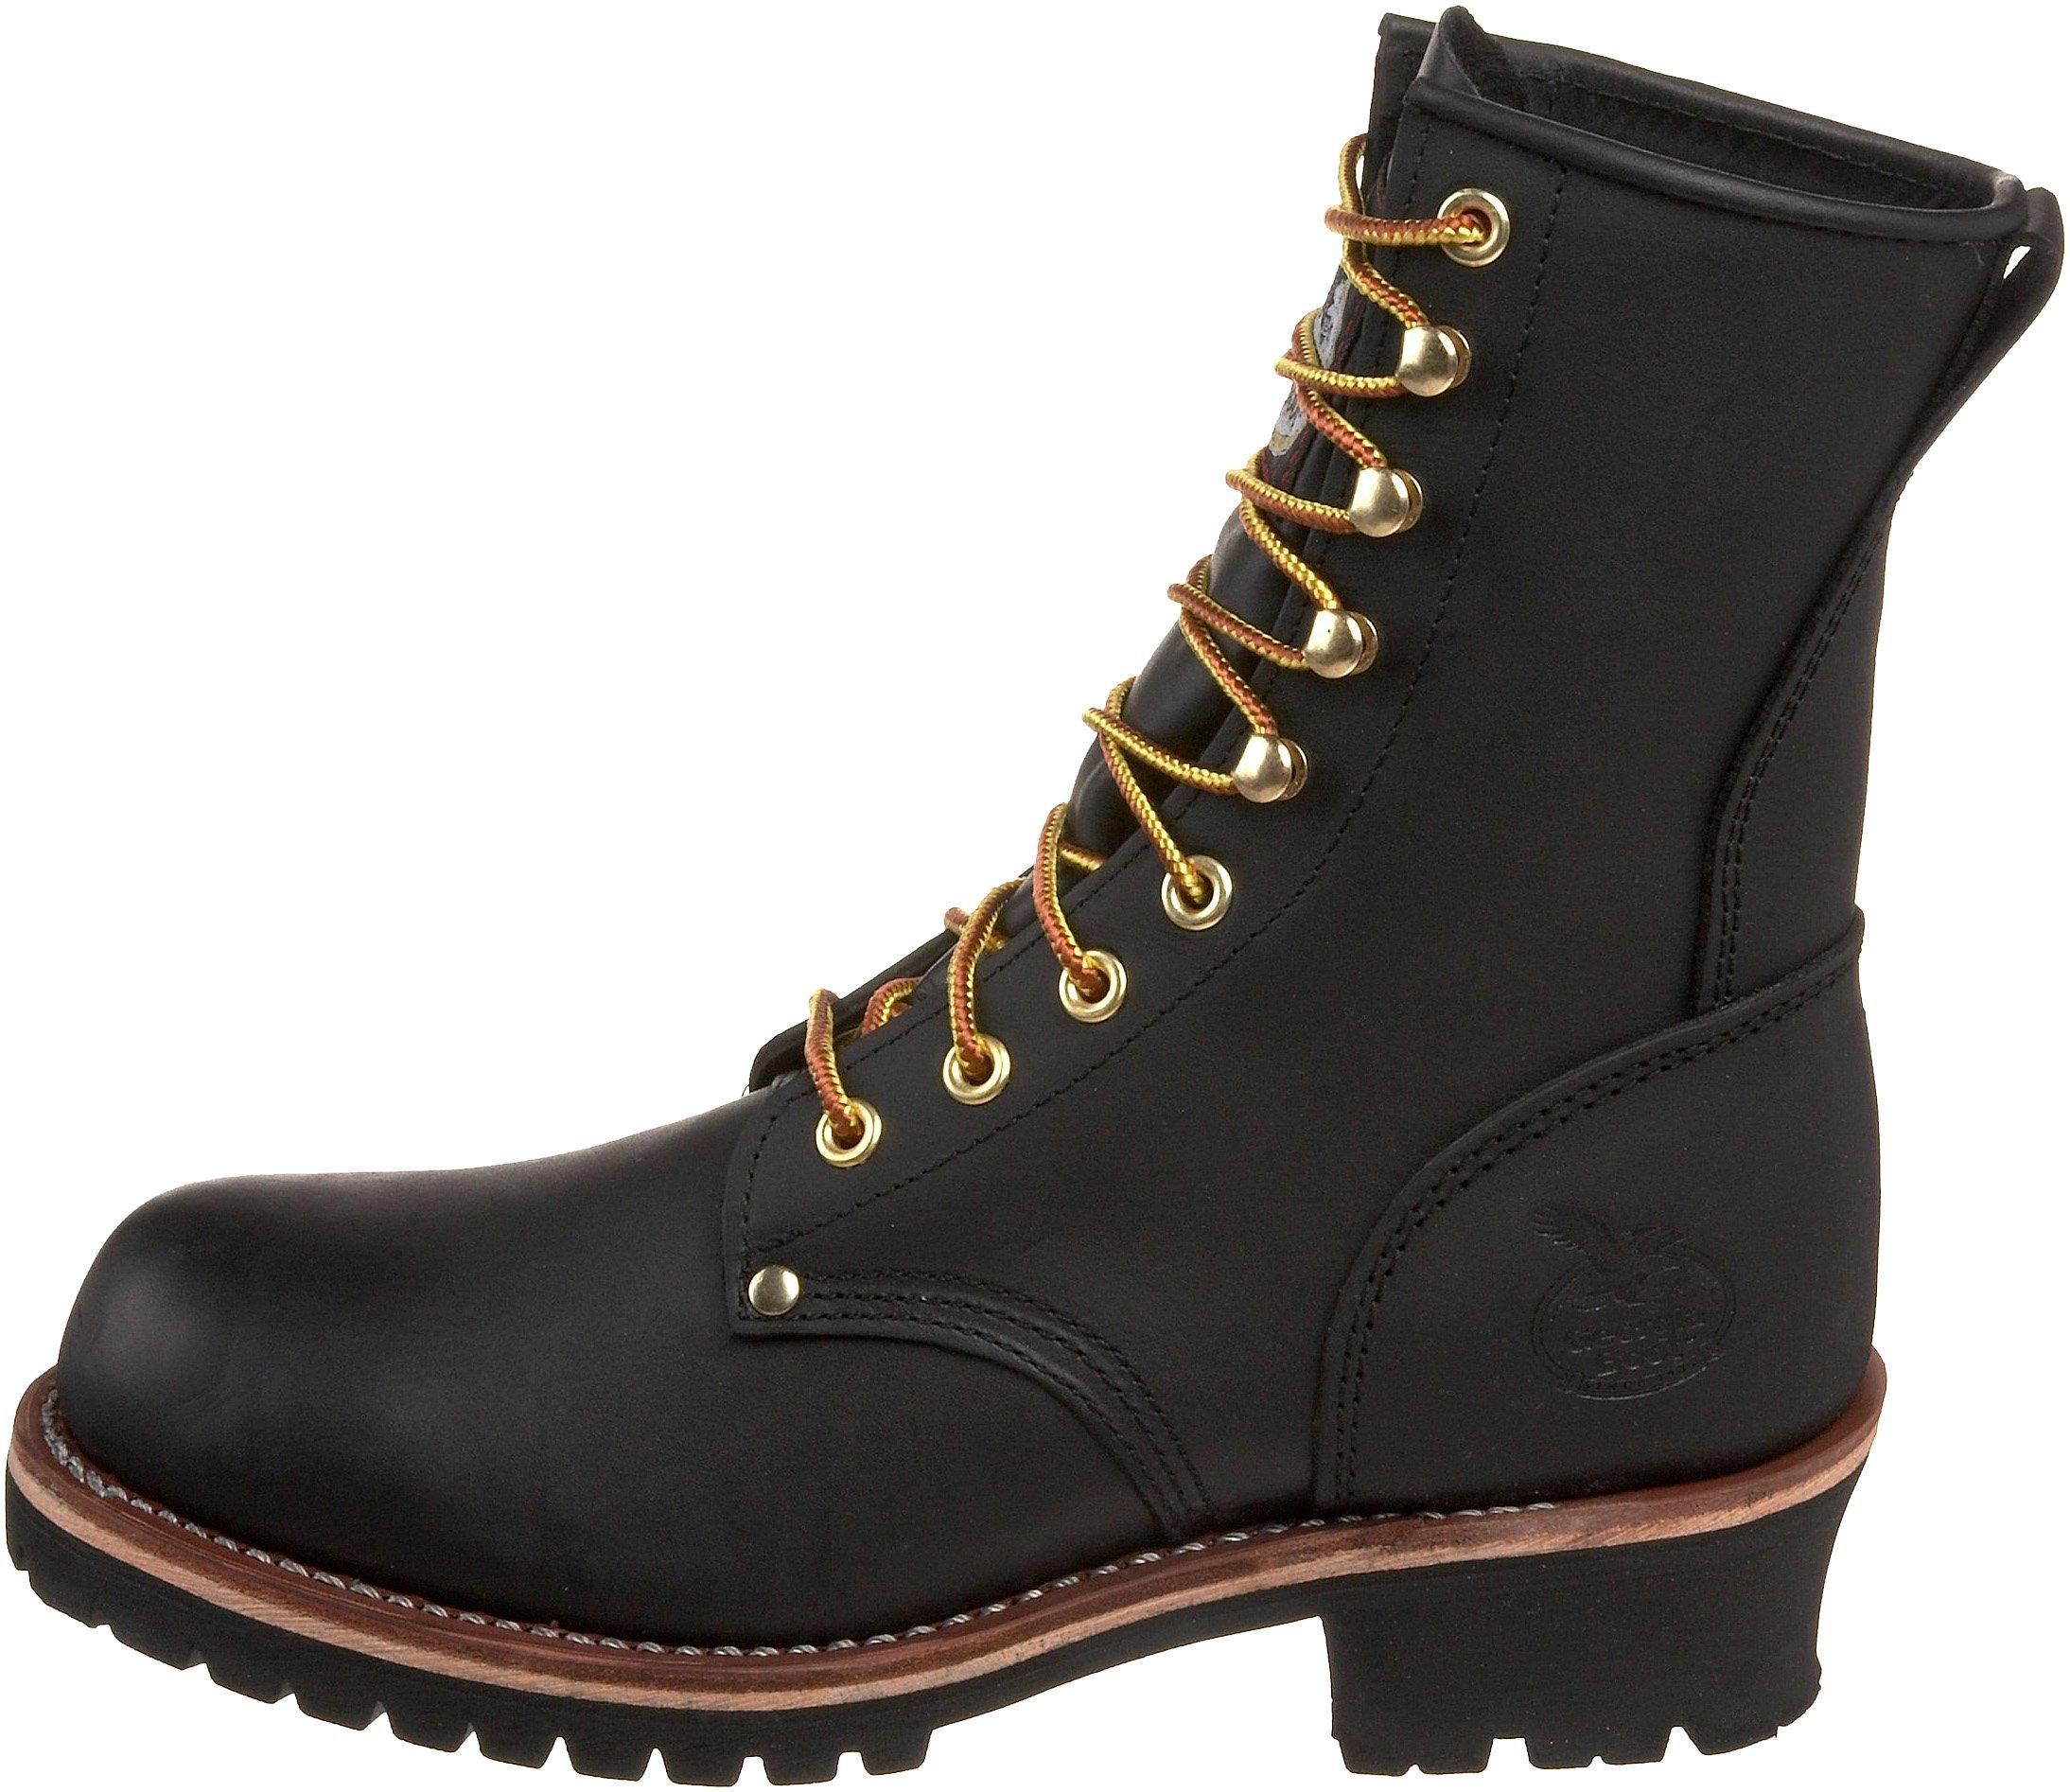 Georgia Boot Men's Logger 8'' Black Non Steel,Oily Black,5 M US by Georgia Boot (Image #5)